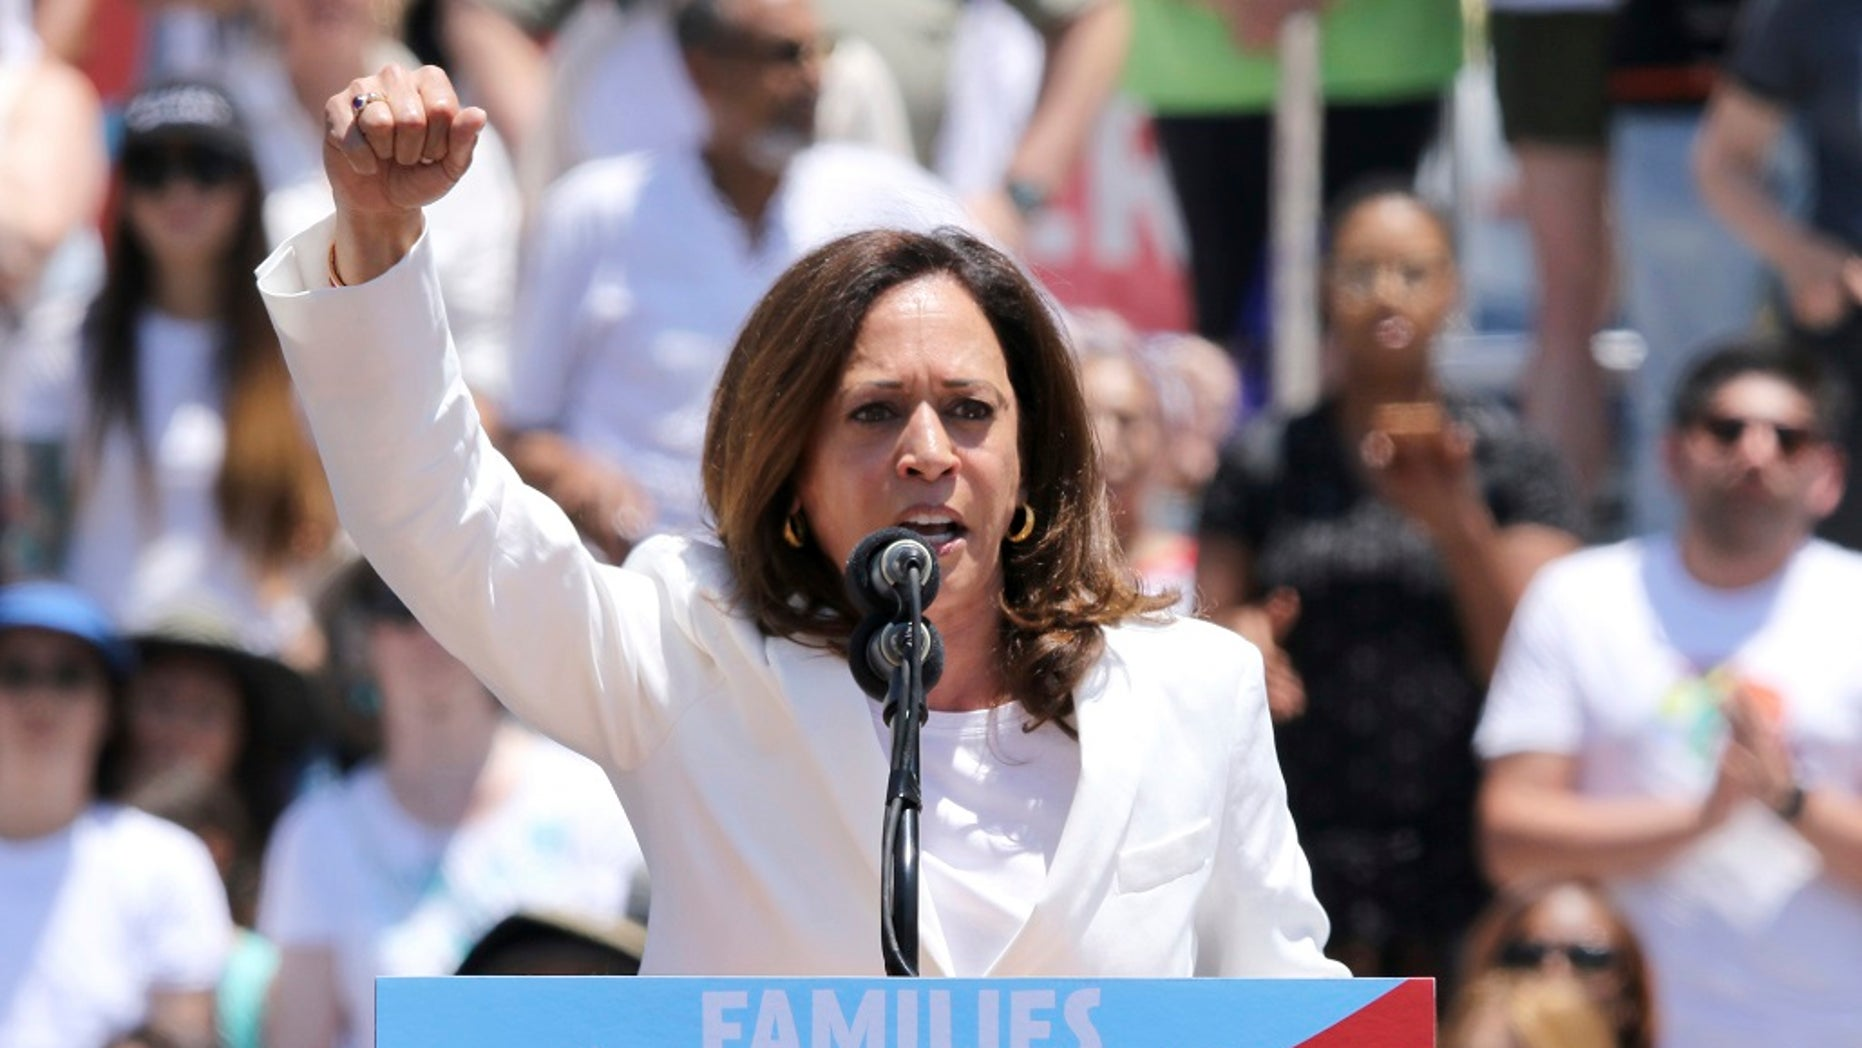 U.S. Sen. Kamala Harris, D-Calif., Speaks at the